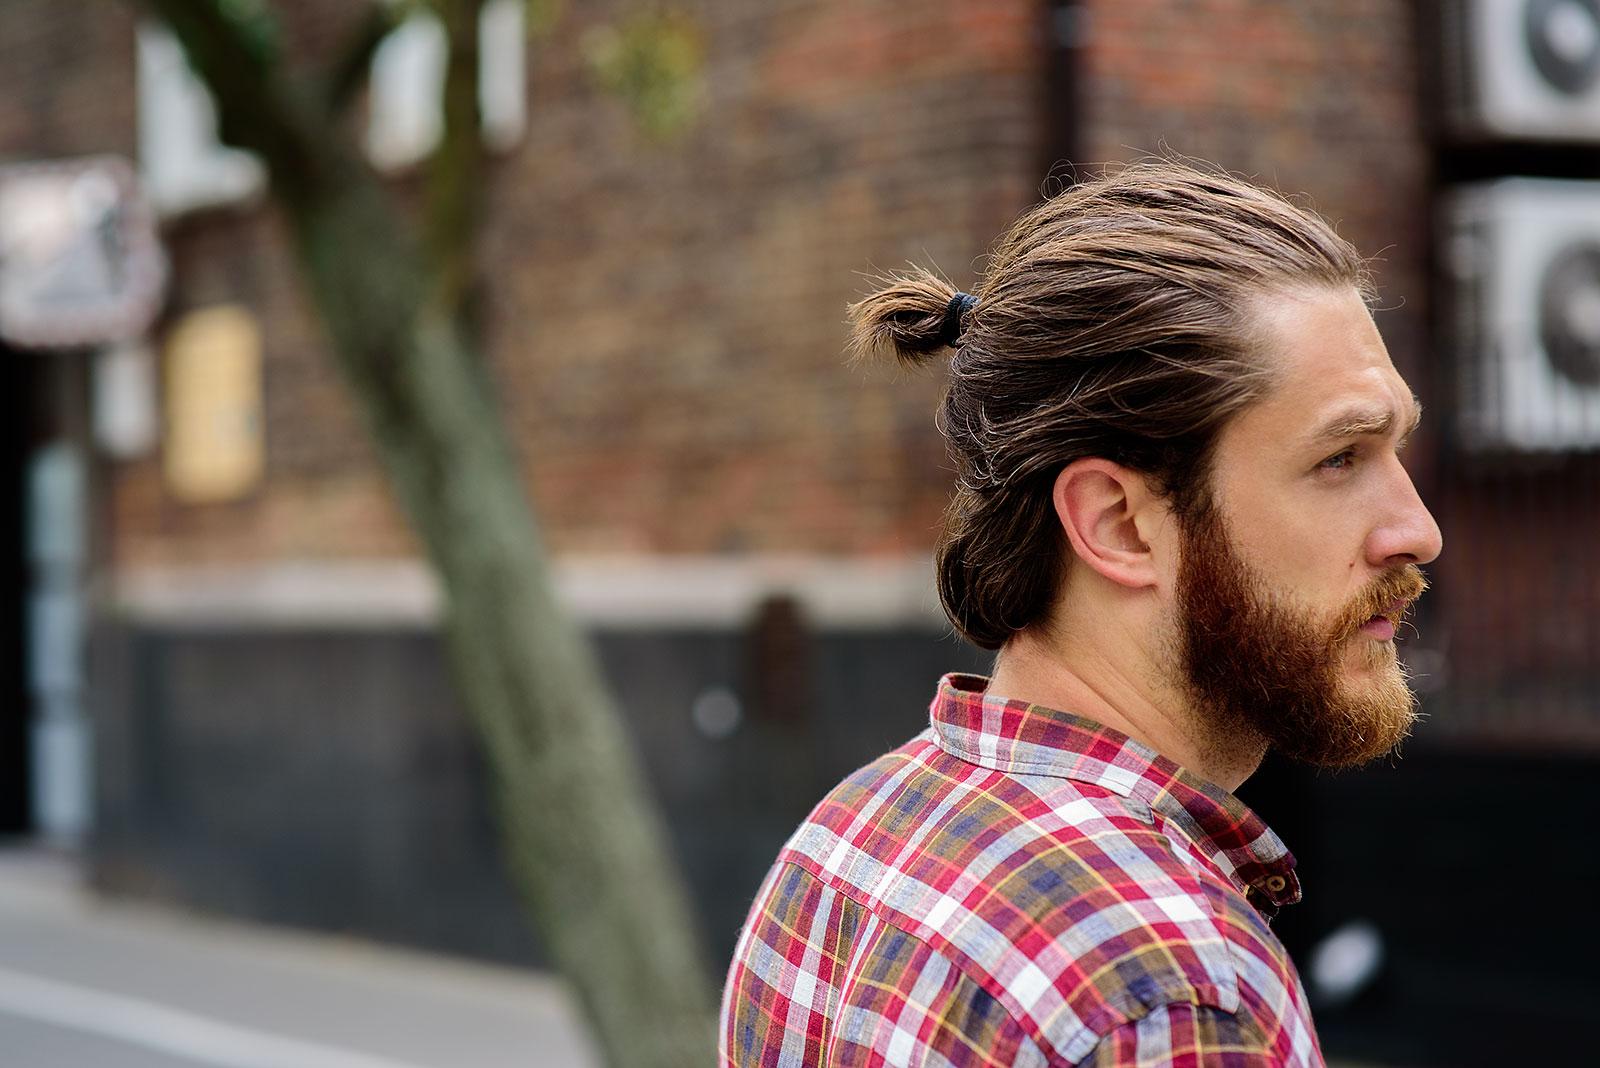 Фото мужских причесок с пучком